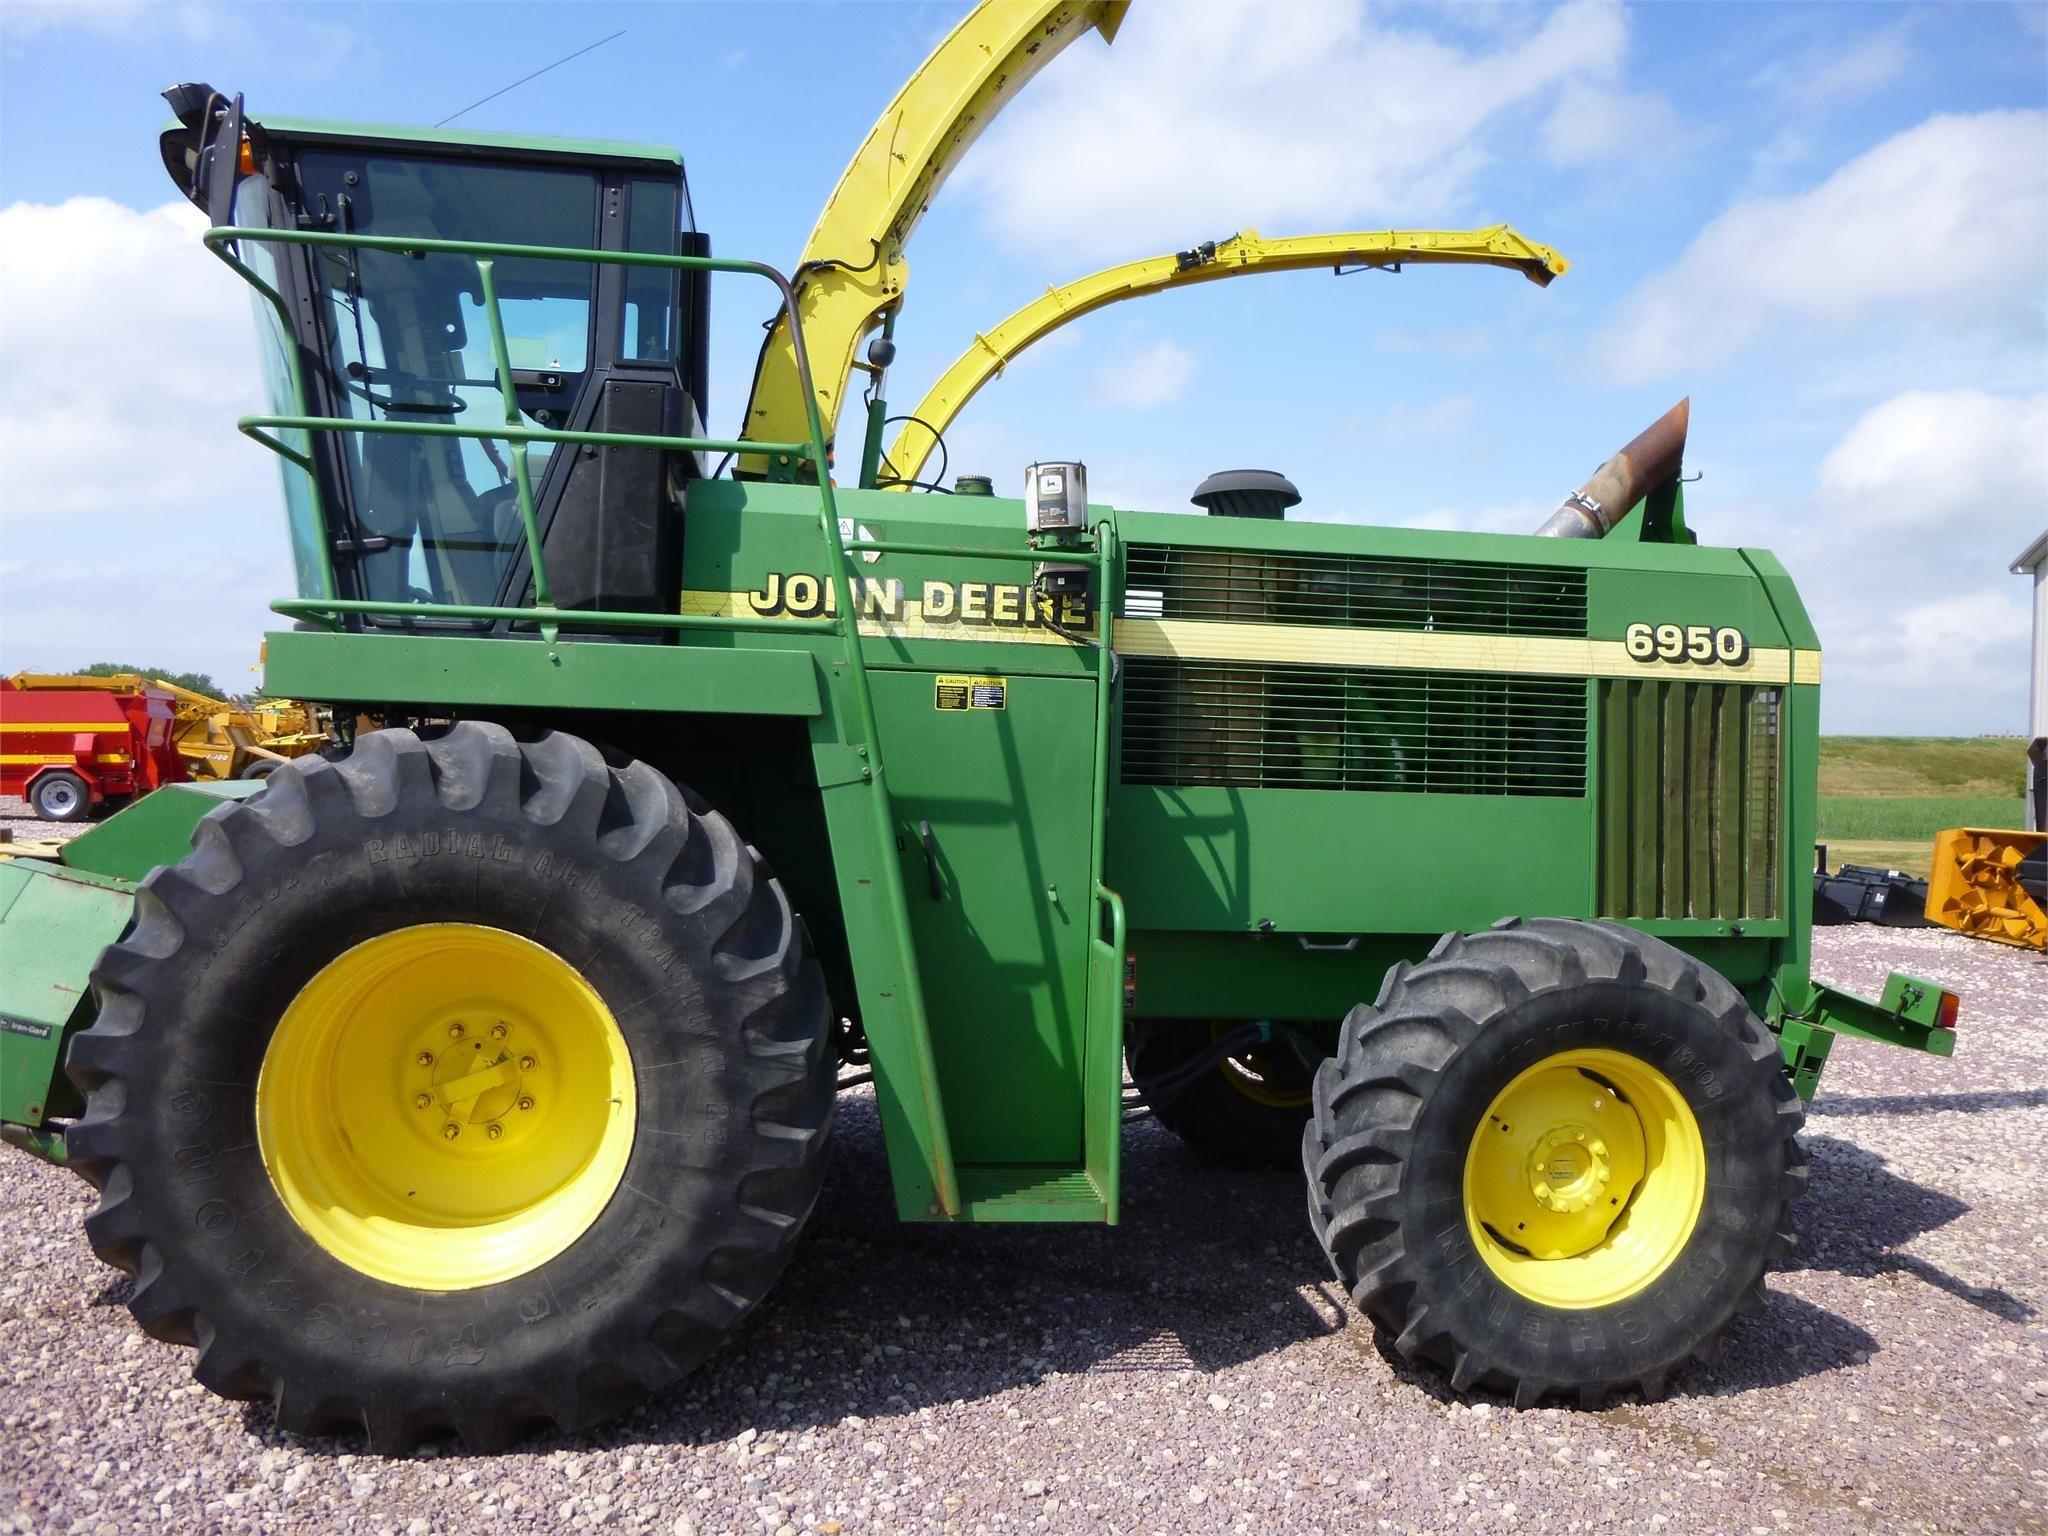 2002 John Deere 6950 Self-Propelled Forage Harvester